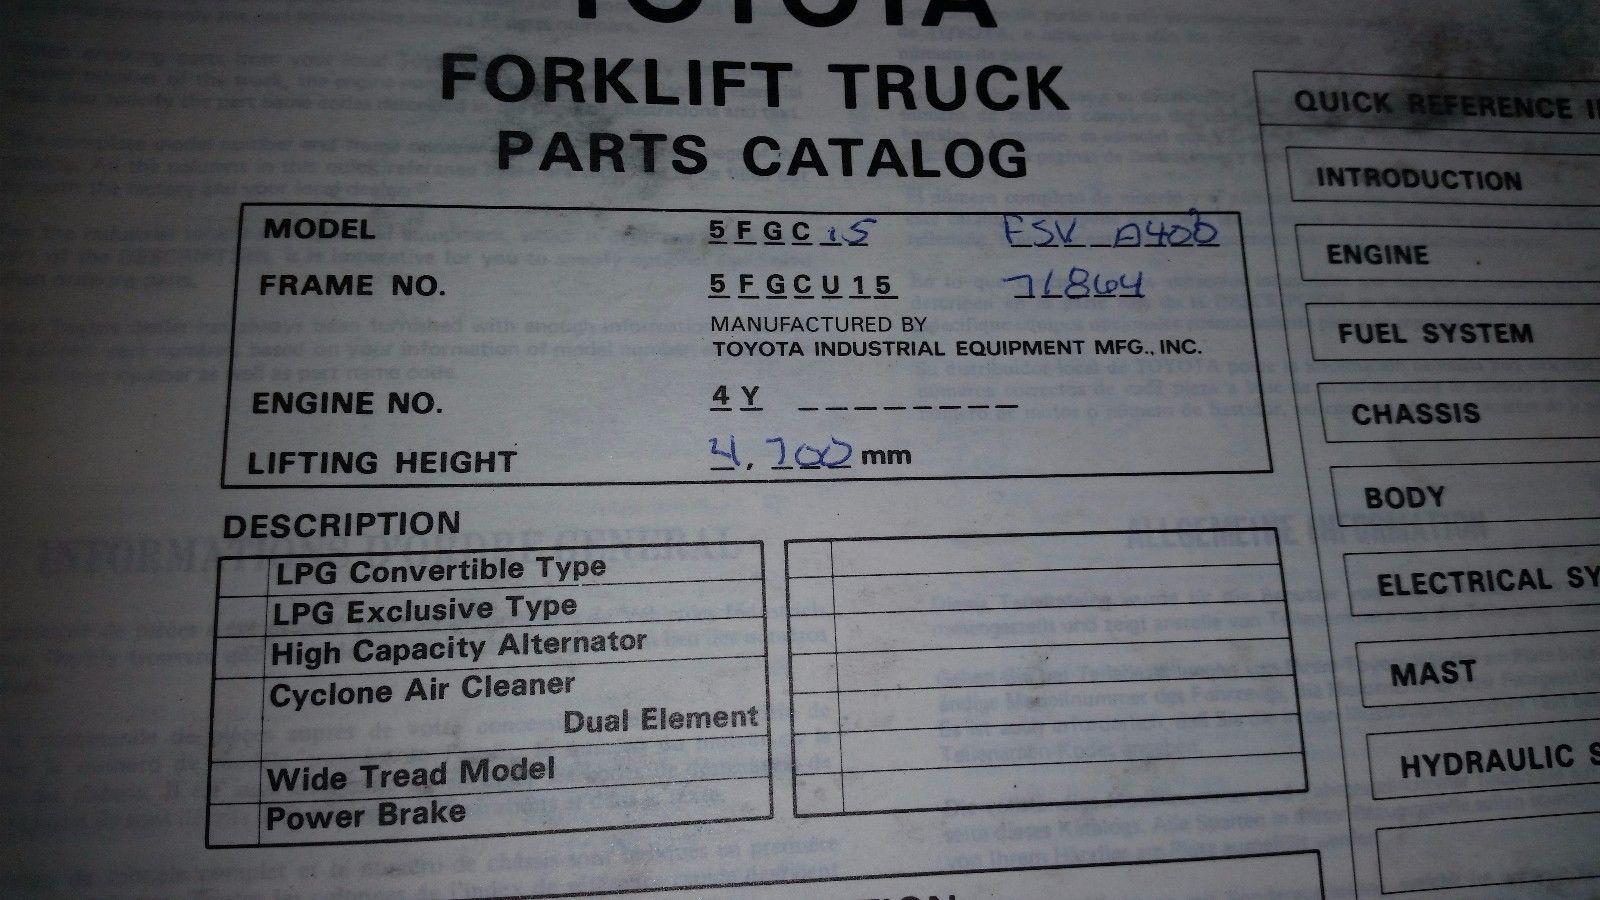 Toyota Forklift 5fgc10,13,15  Parts Catalog Manual